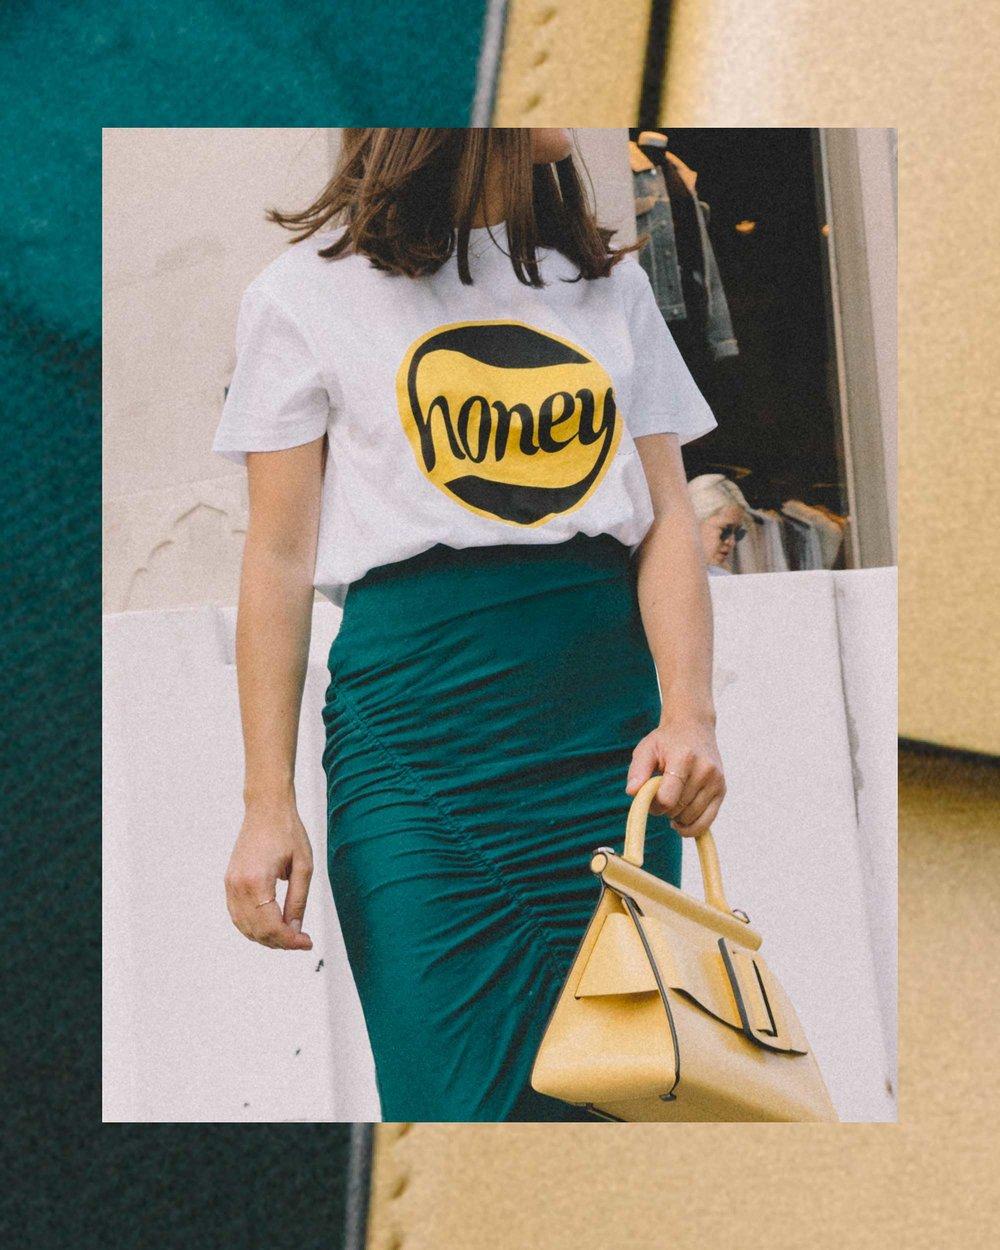 GANNI Honey T-Shirt, House of Harlow 1960 Ruching Midi Skirts High Waisted Skirts Mesh Sheer Turquoise Skirts, Boyy Karl 24 buckled leather tote yellow4.jpg